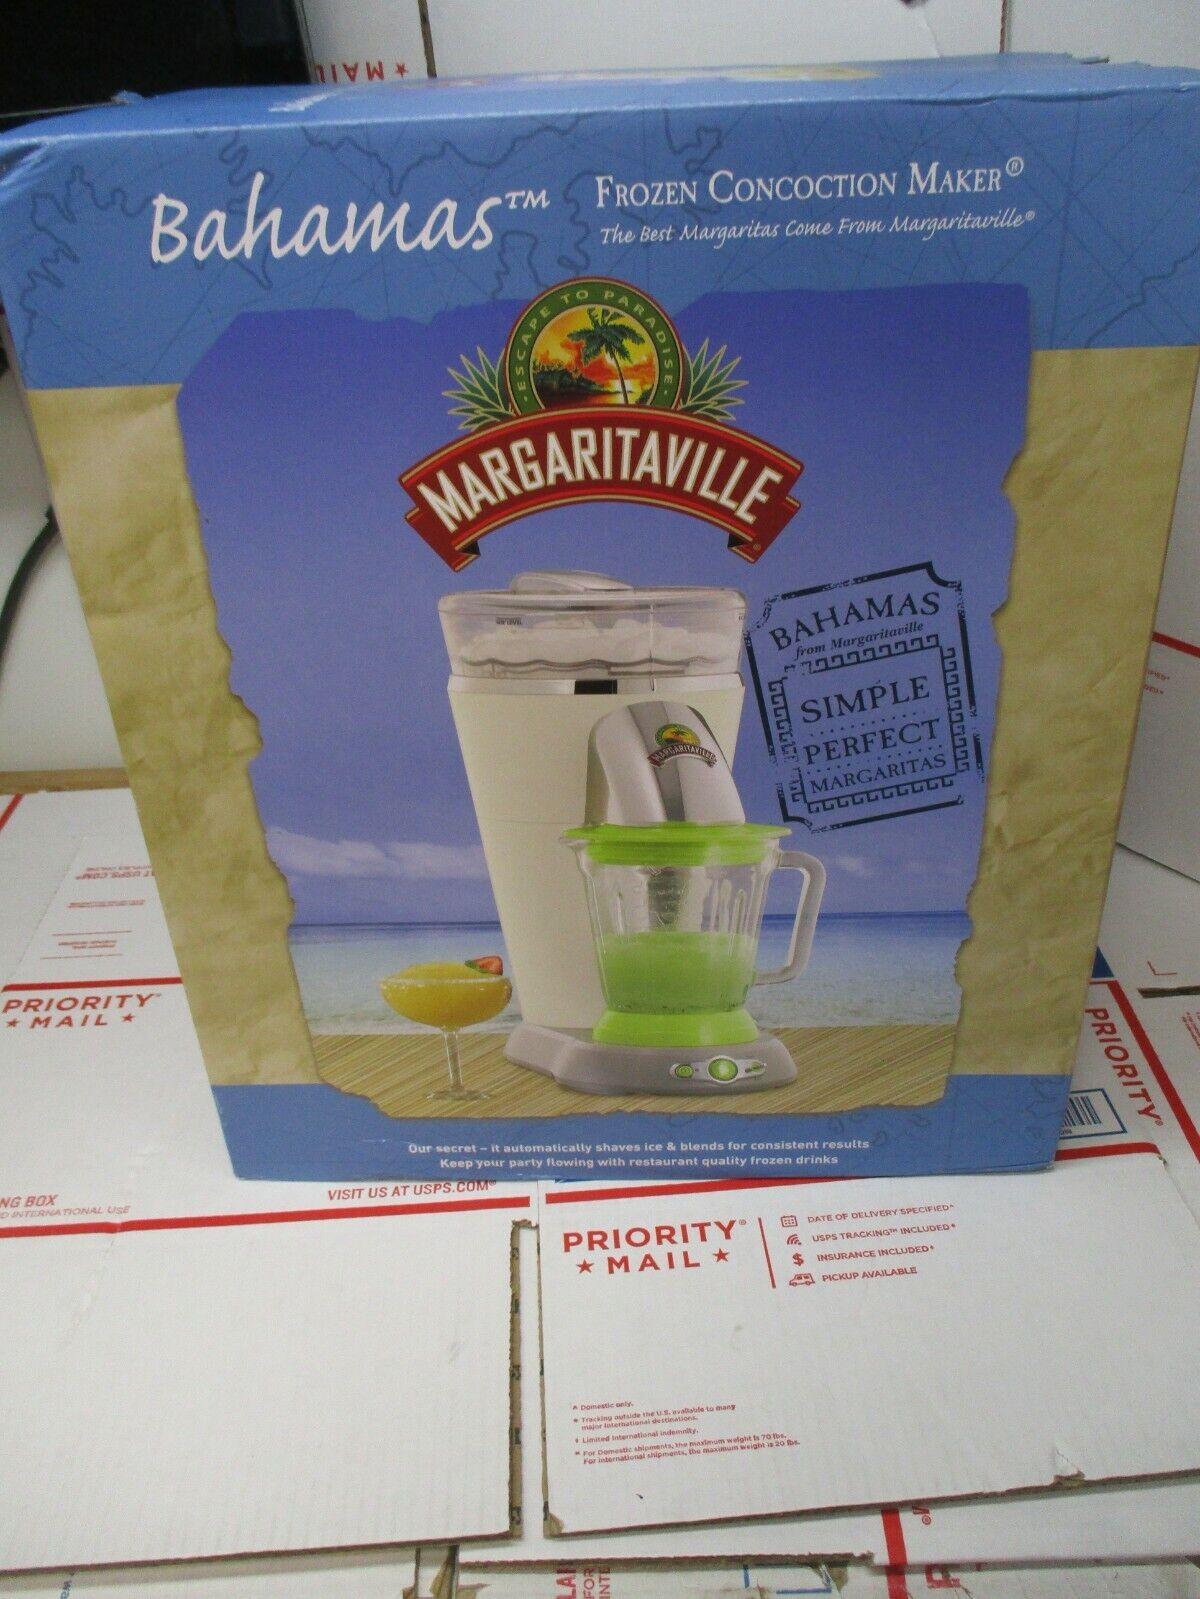 Margaritaville DM0500 Bahamas Frozen Concoction Maker